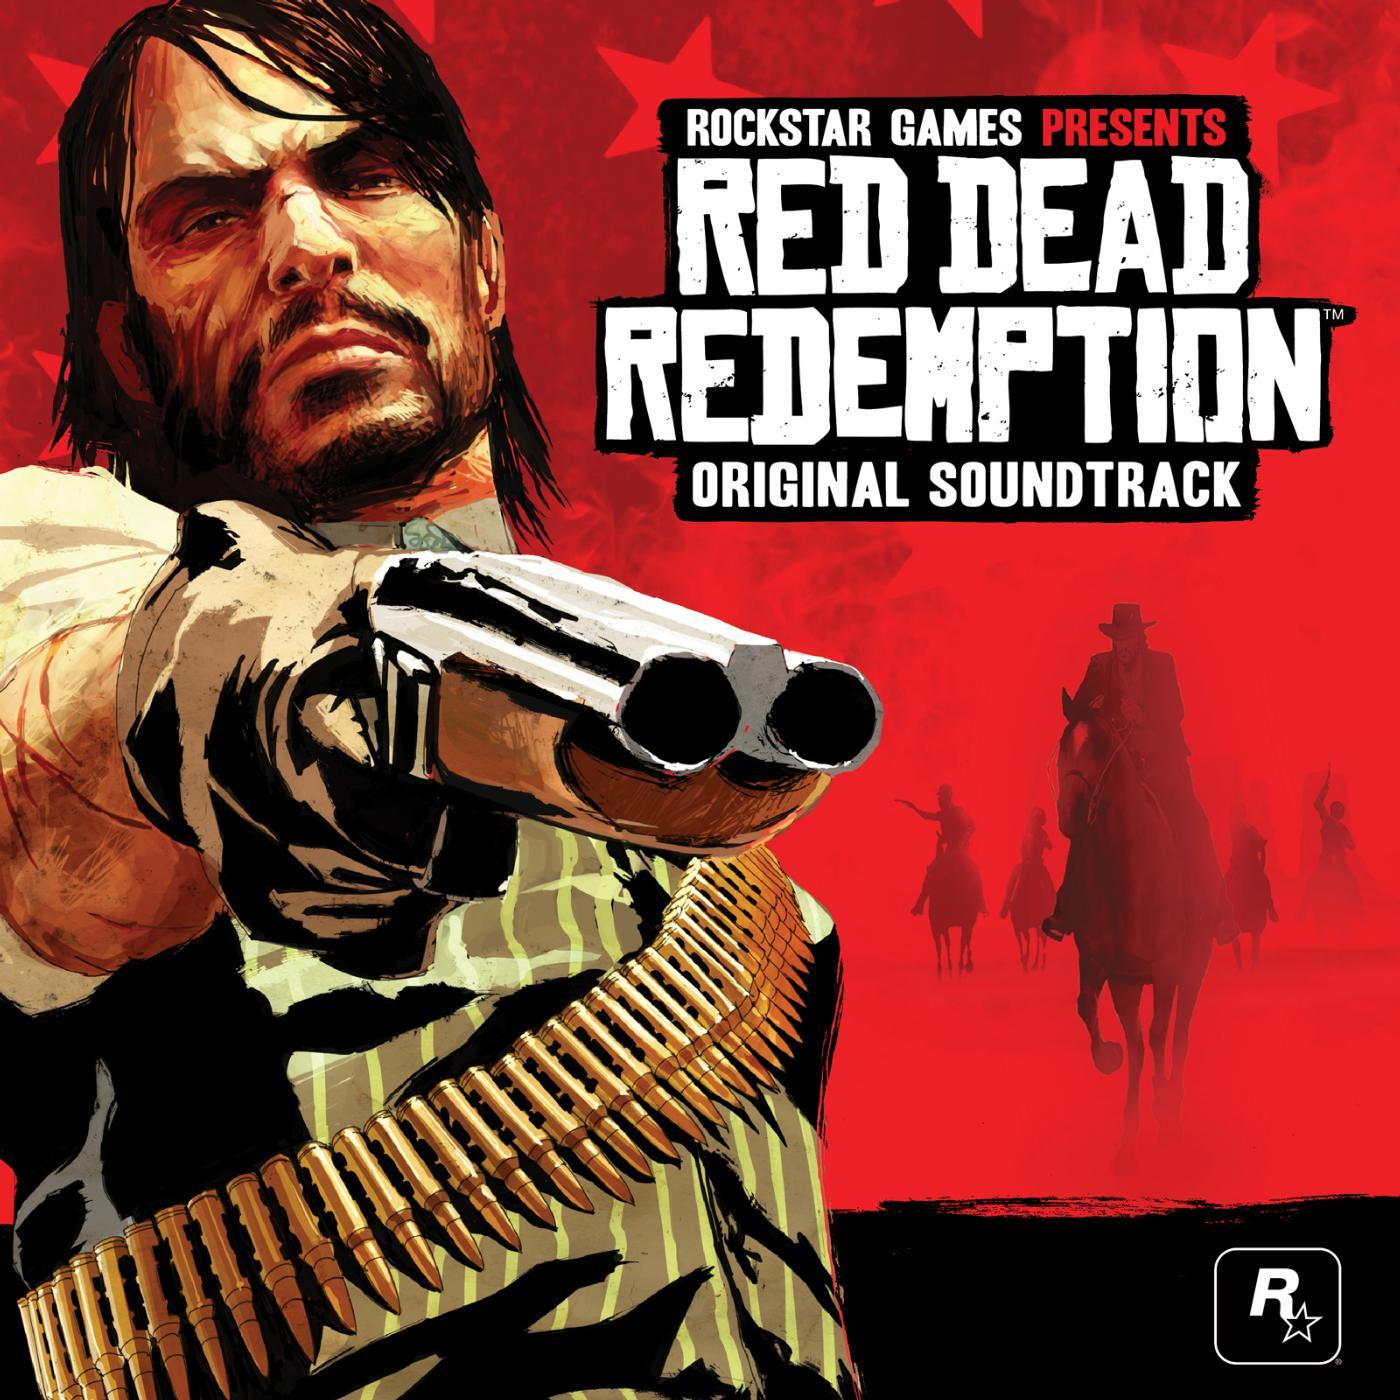 آلبوم موسیقی متن Red Dead Redemption